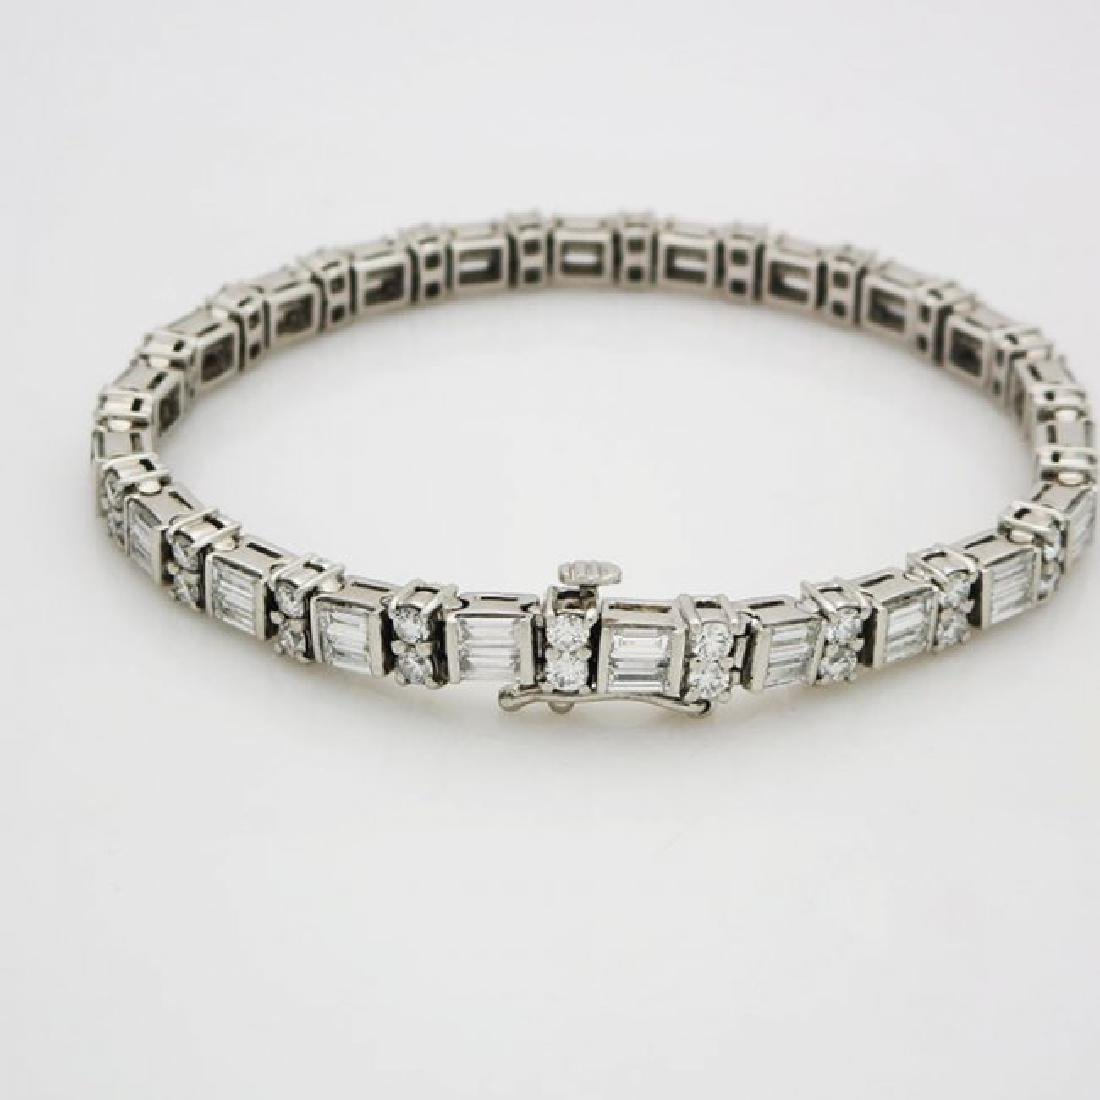 Estate 950 Platinum and apx 8CT VS/F Diamond Bracelet